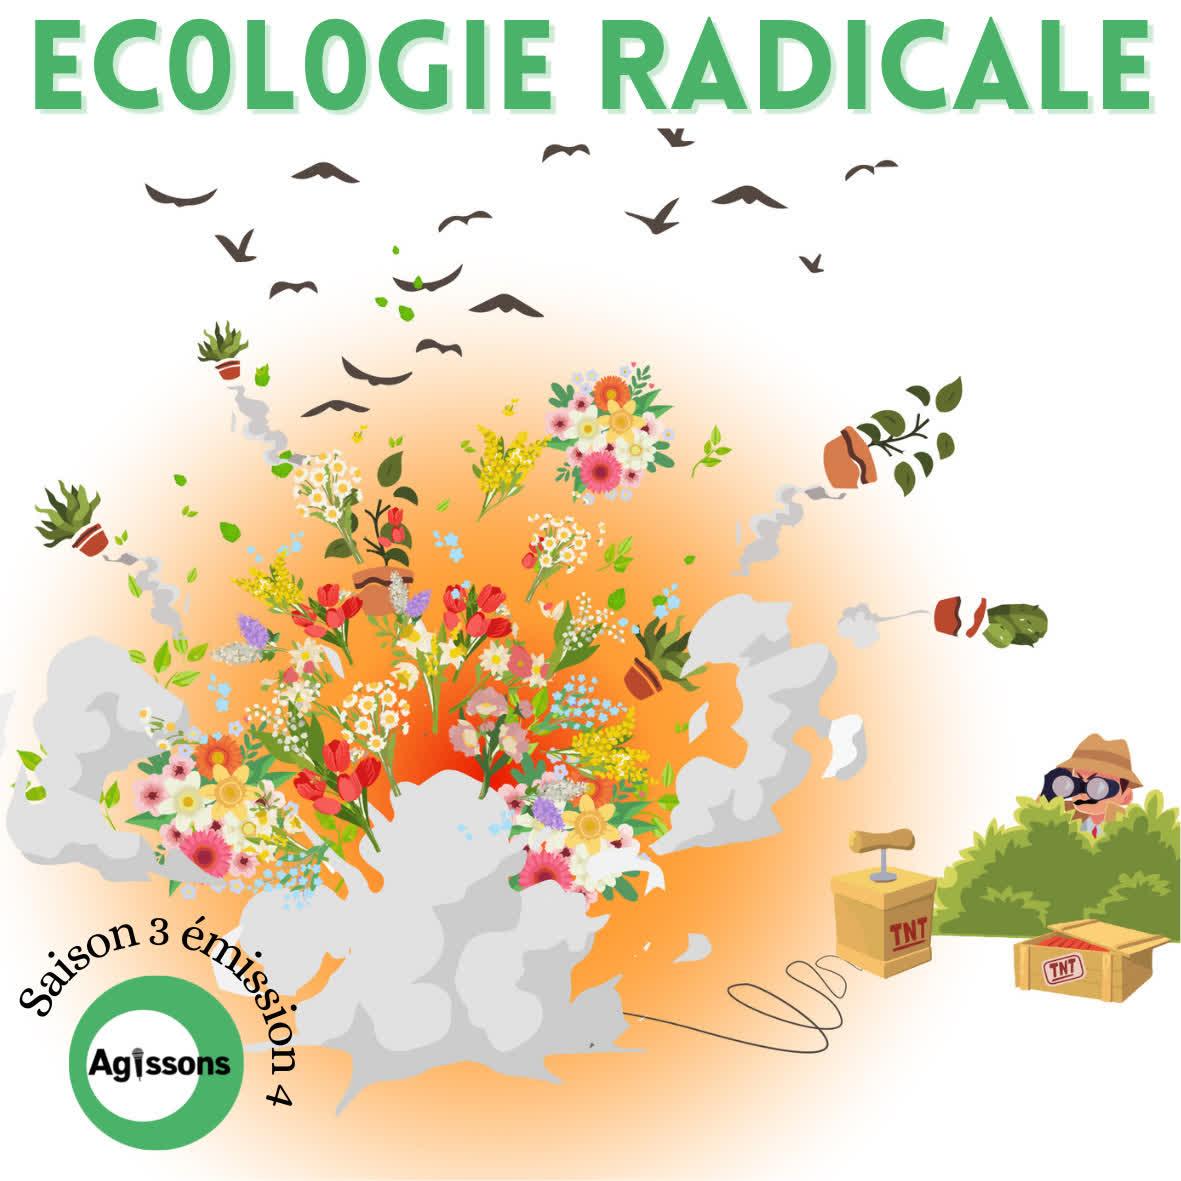 Ecologie radicale (s03e04)